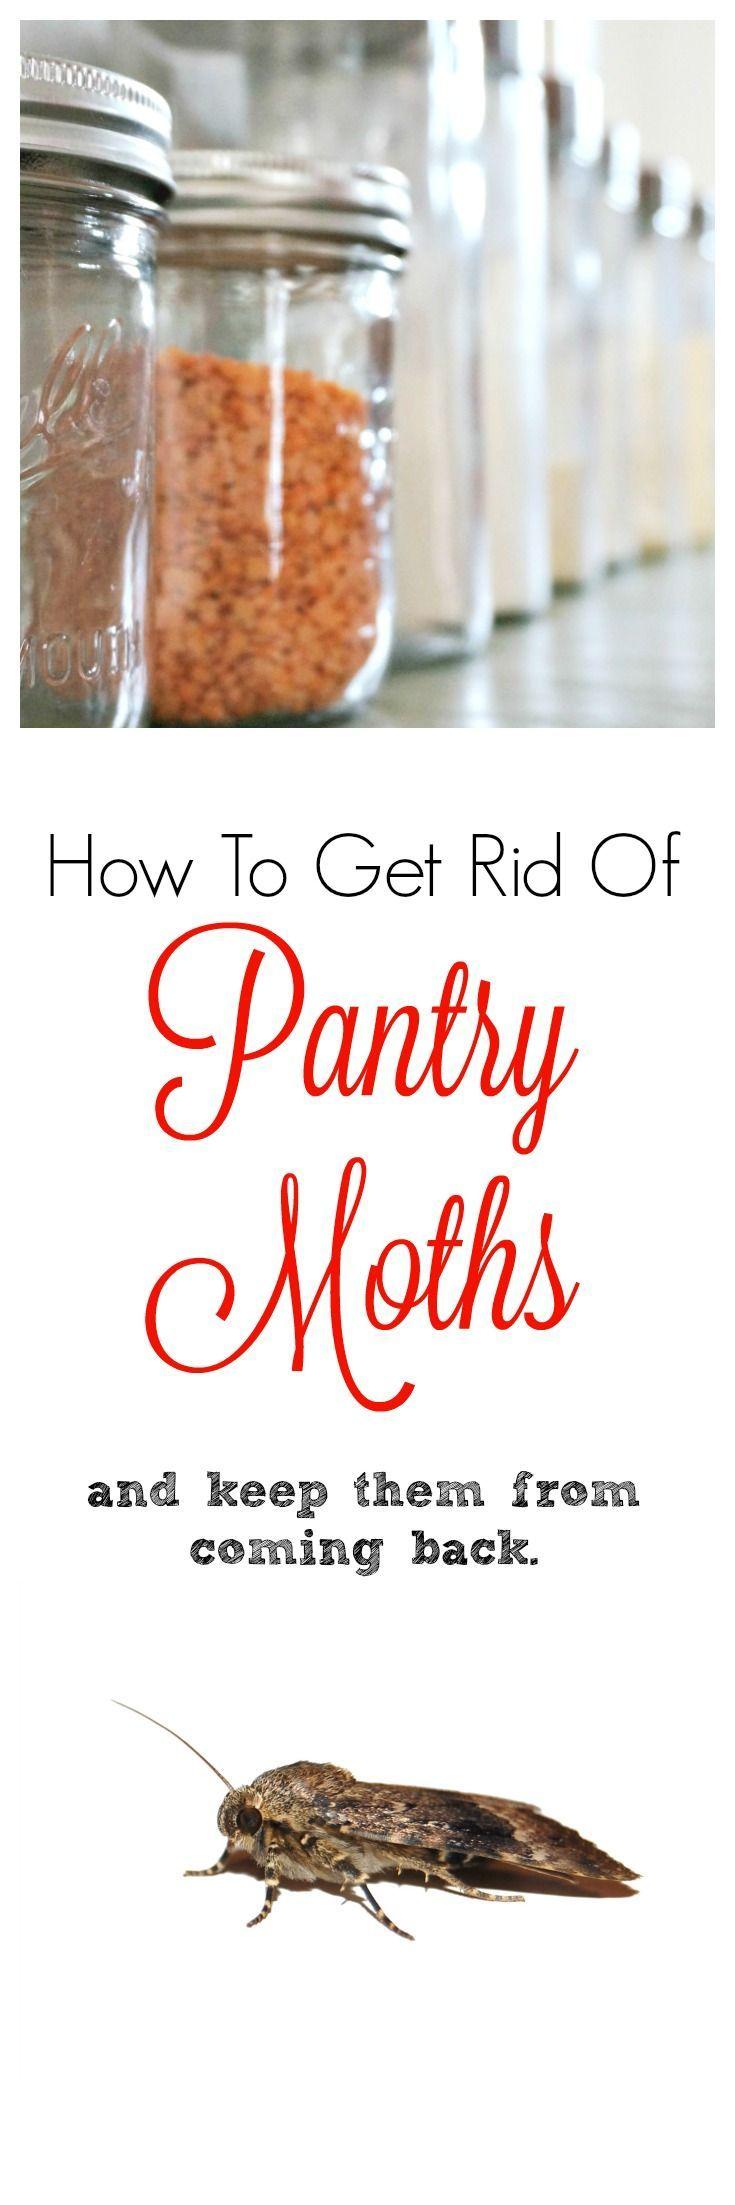 How I Finally Got Rid of Pantry Moths! | diy | Pinterest | Pantry ...